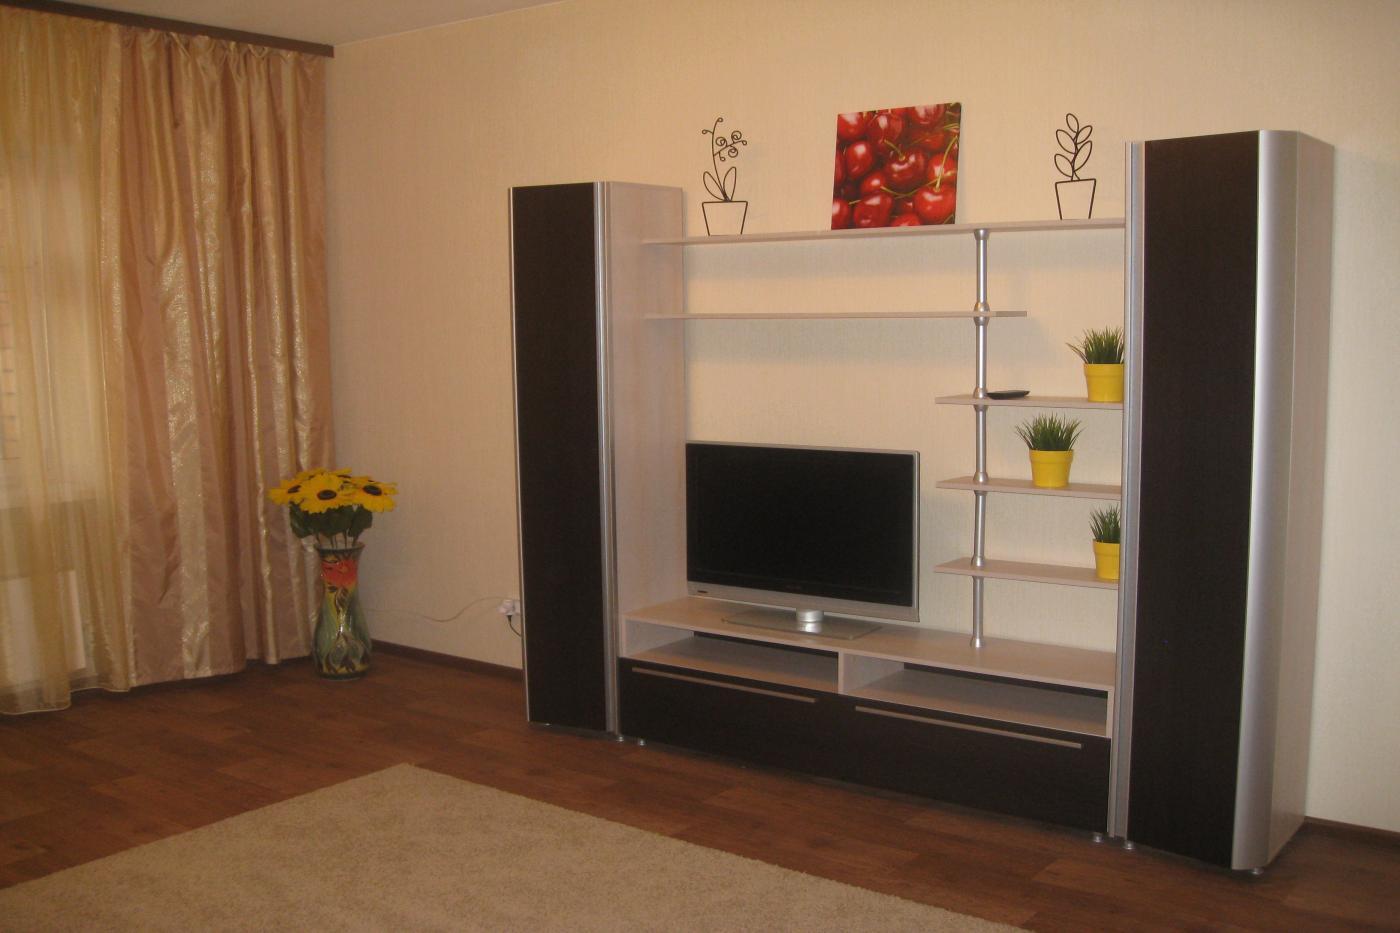 3-комнатная квартира посуточно (вариант № 917), ул. Адоратского улица, фото № 6